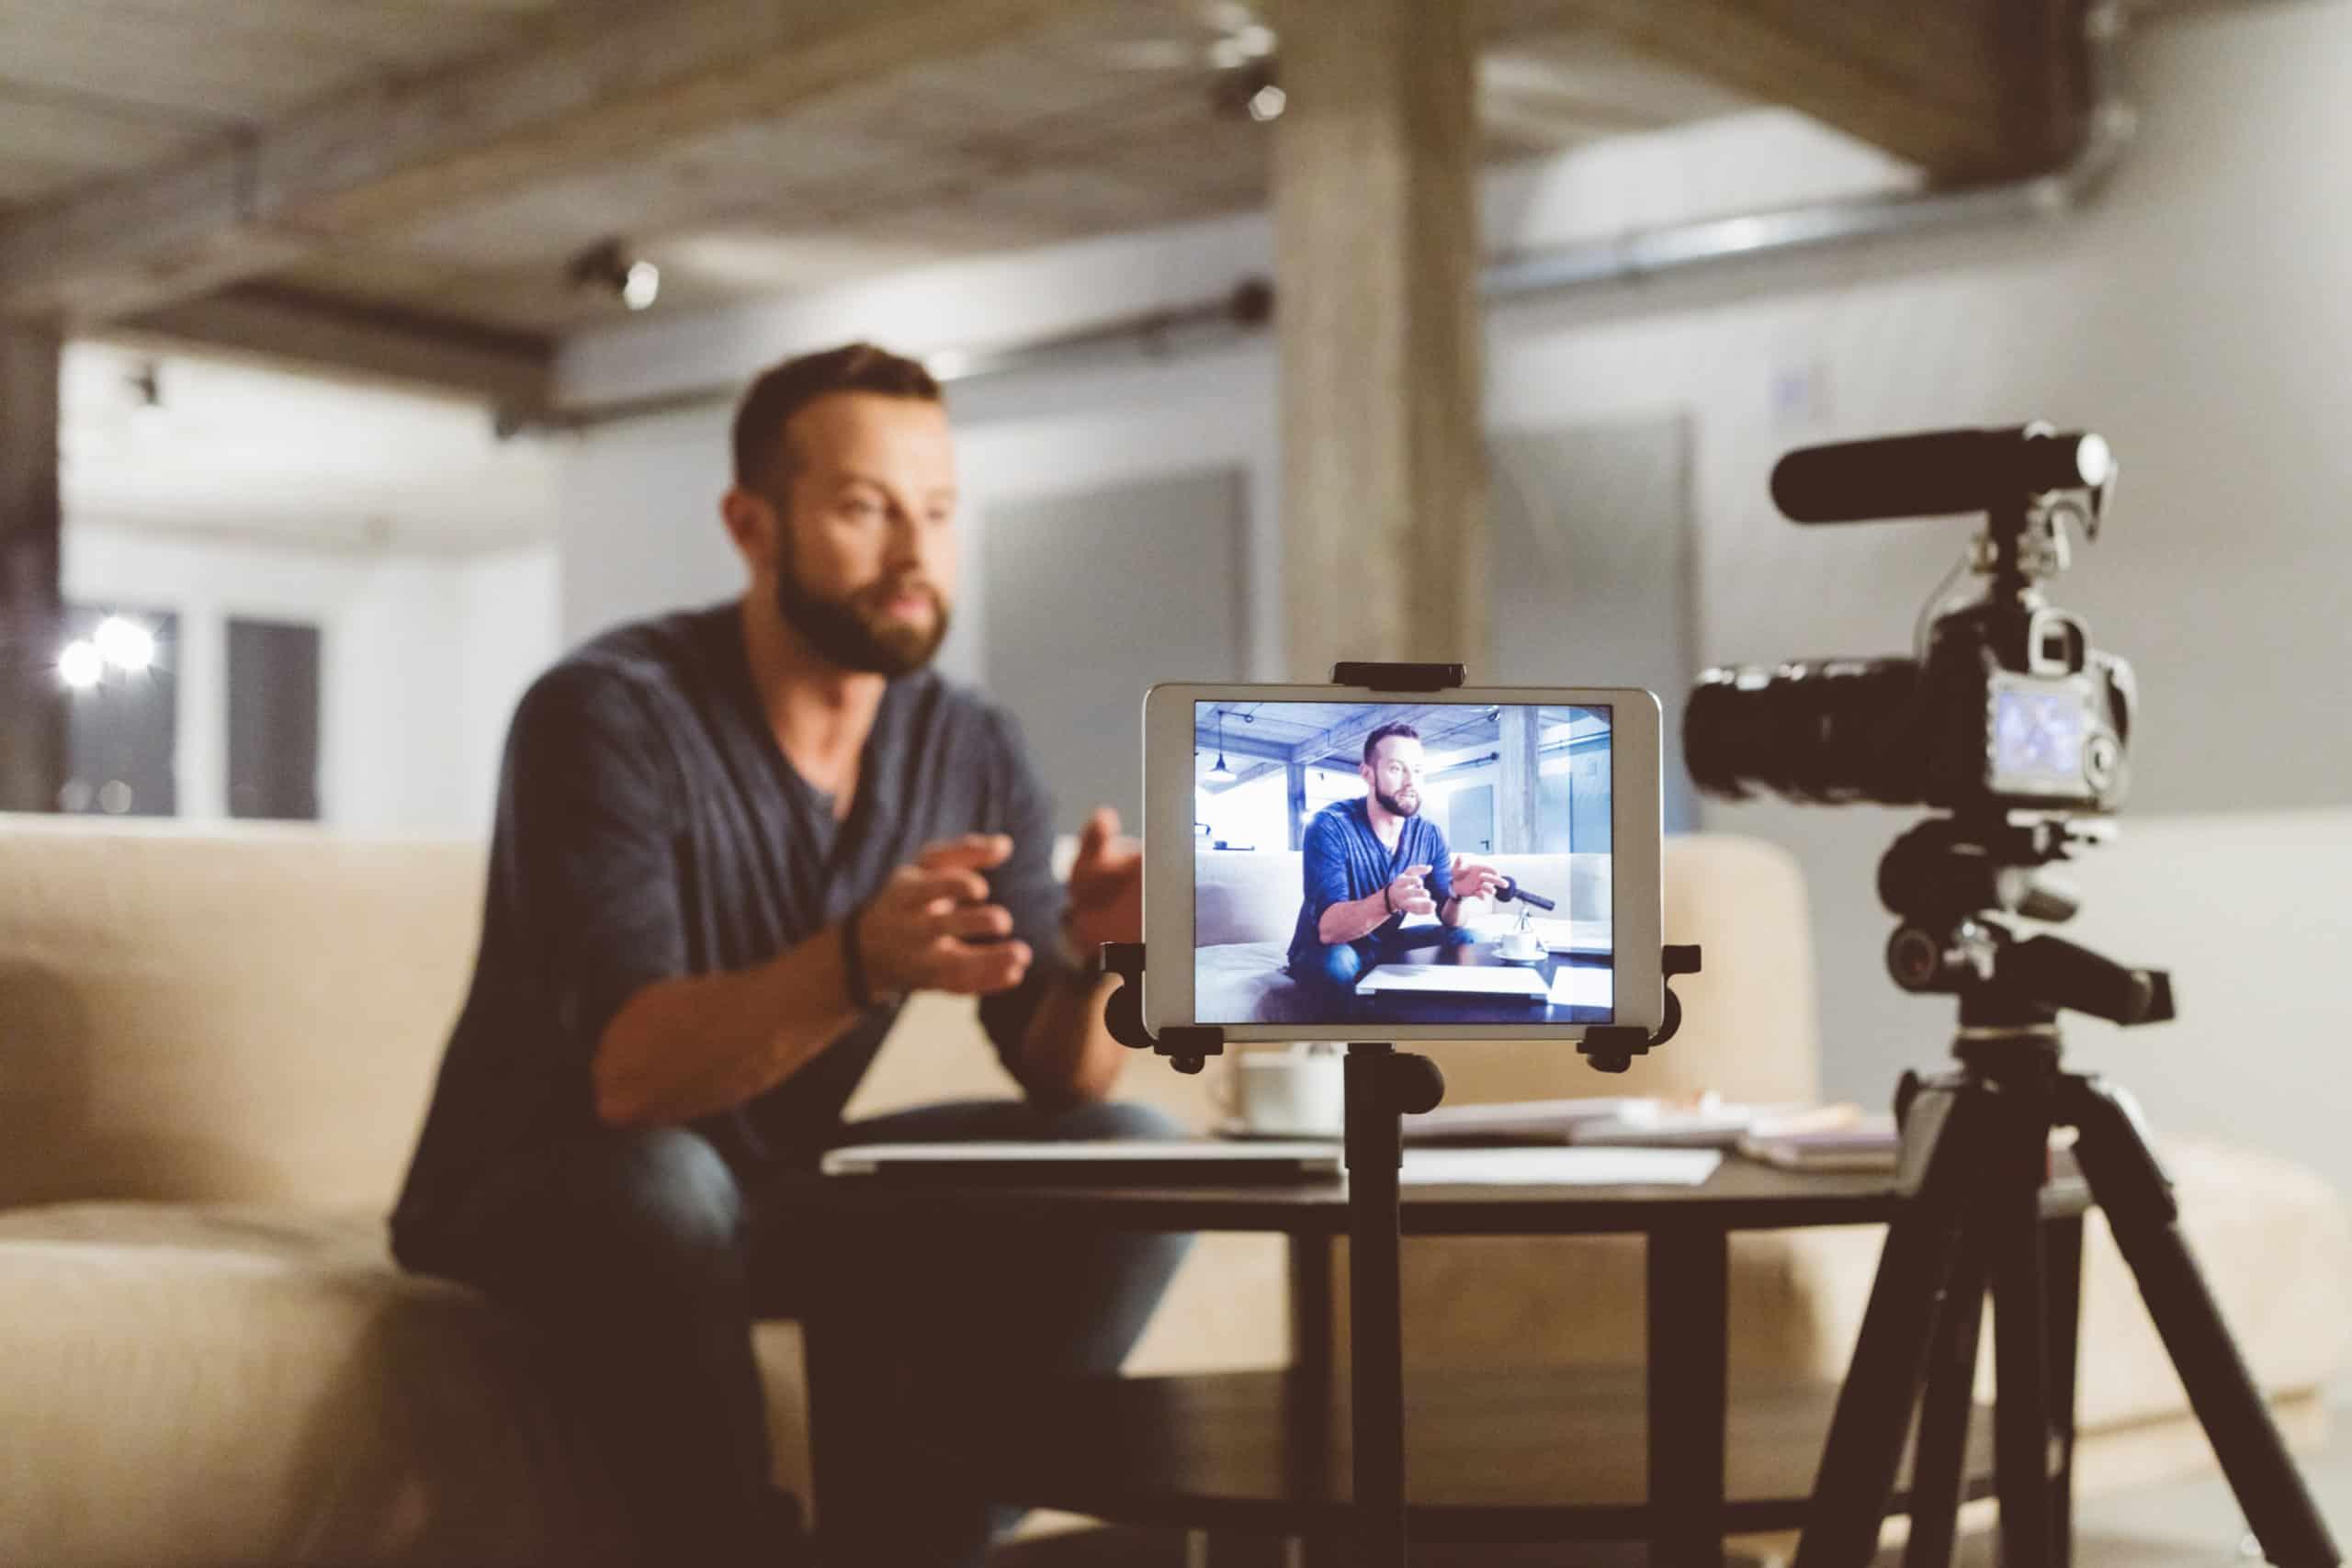 video marketing trends 2022